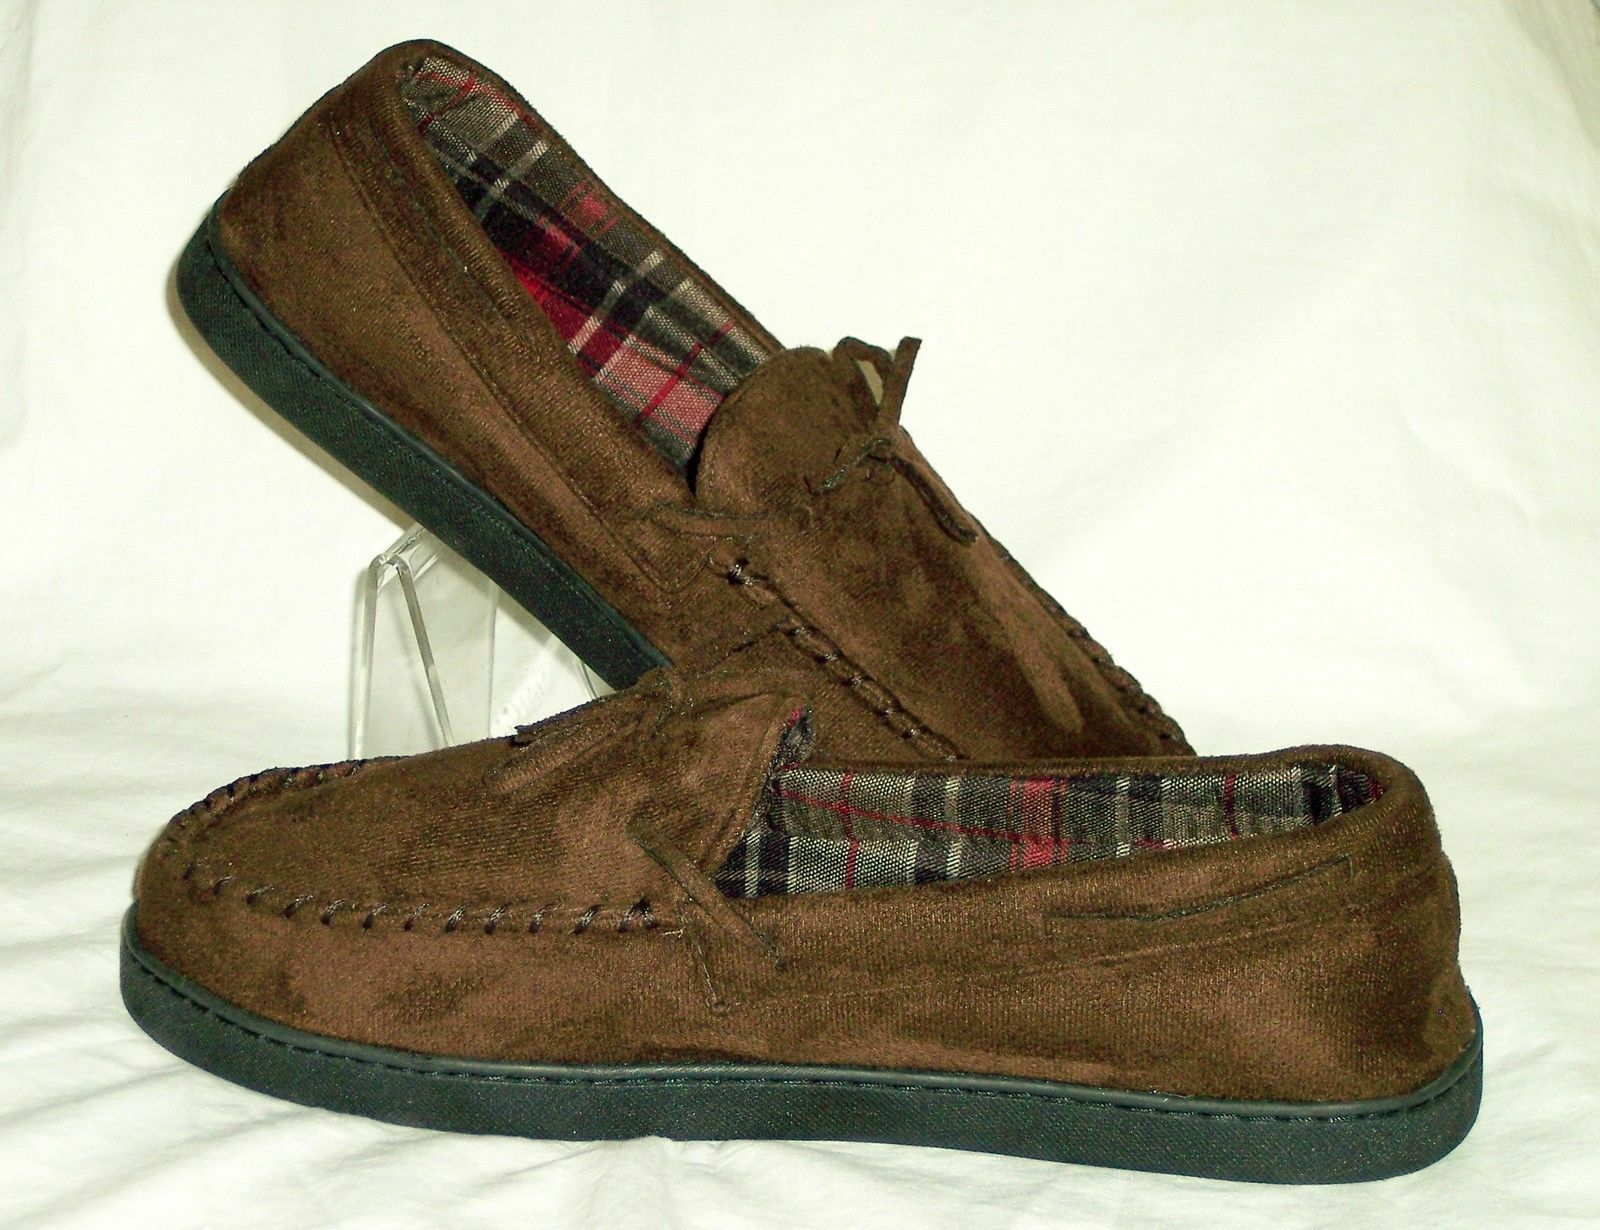 Pantofole da uomo uomoS Club Room Moccasin Slip-On Slipper Faux Suede Brown Mark Sz XL-11-12